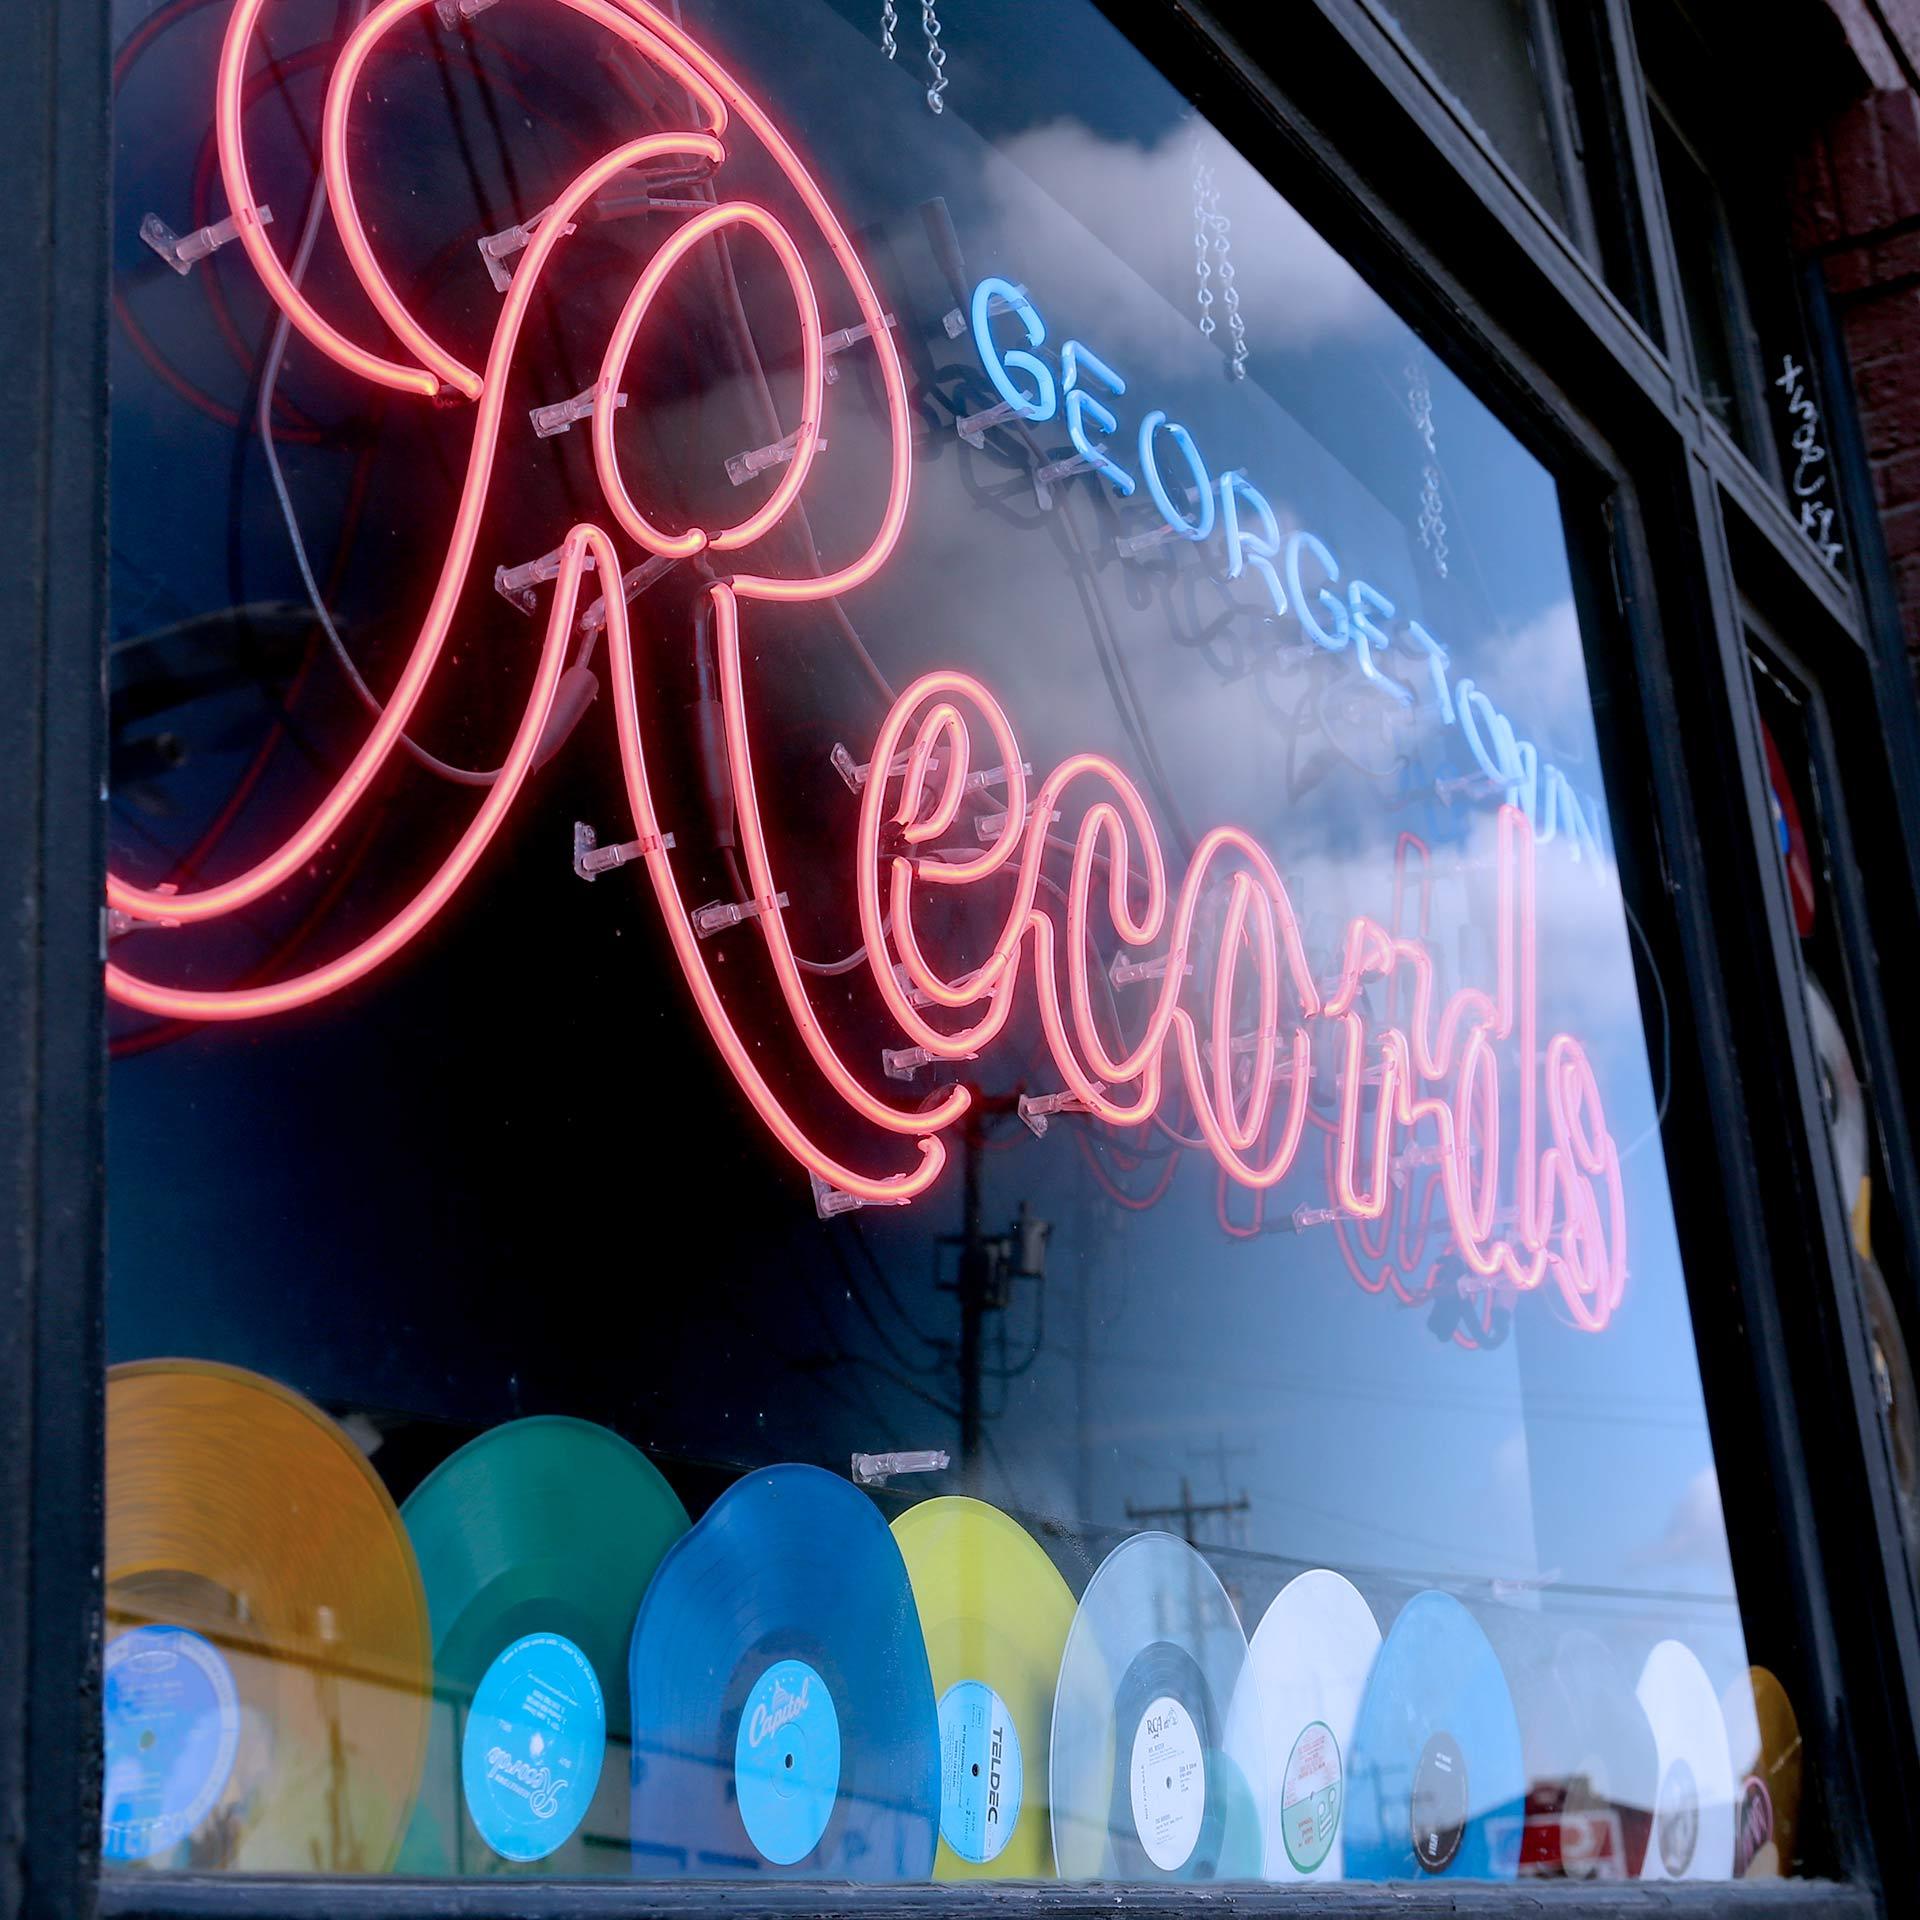 Georgetown Records window display